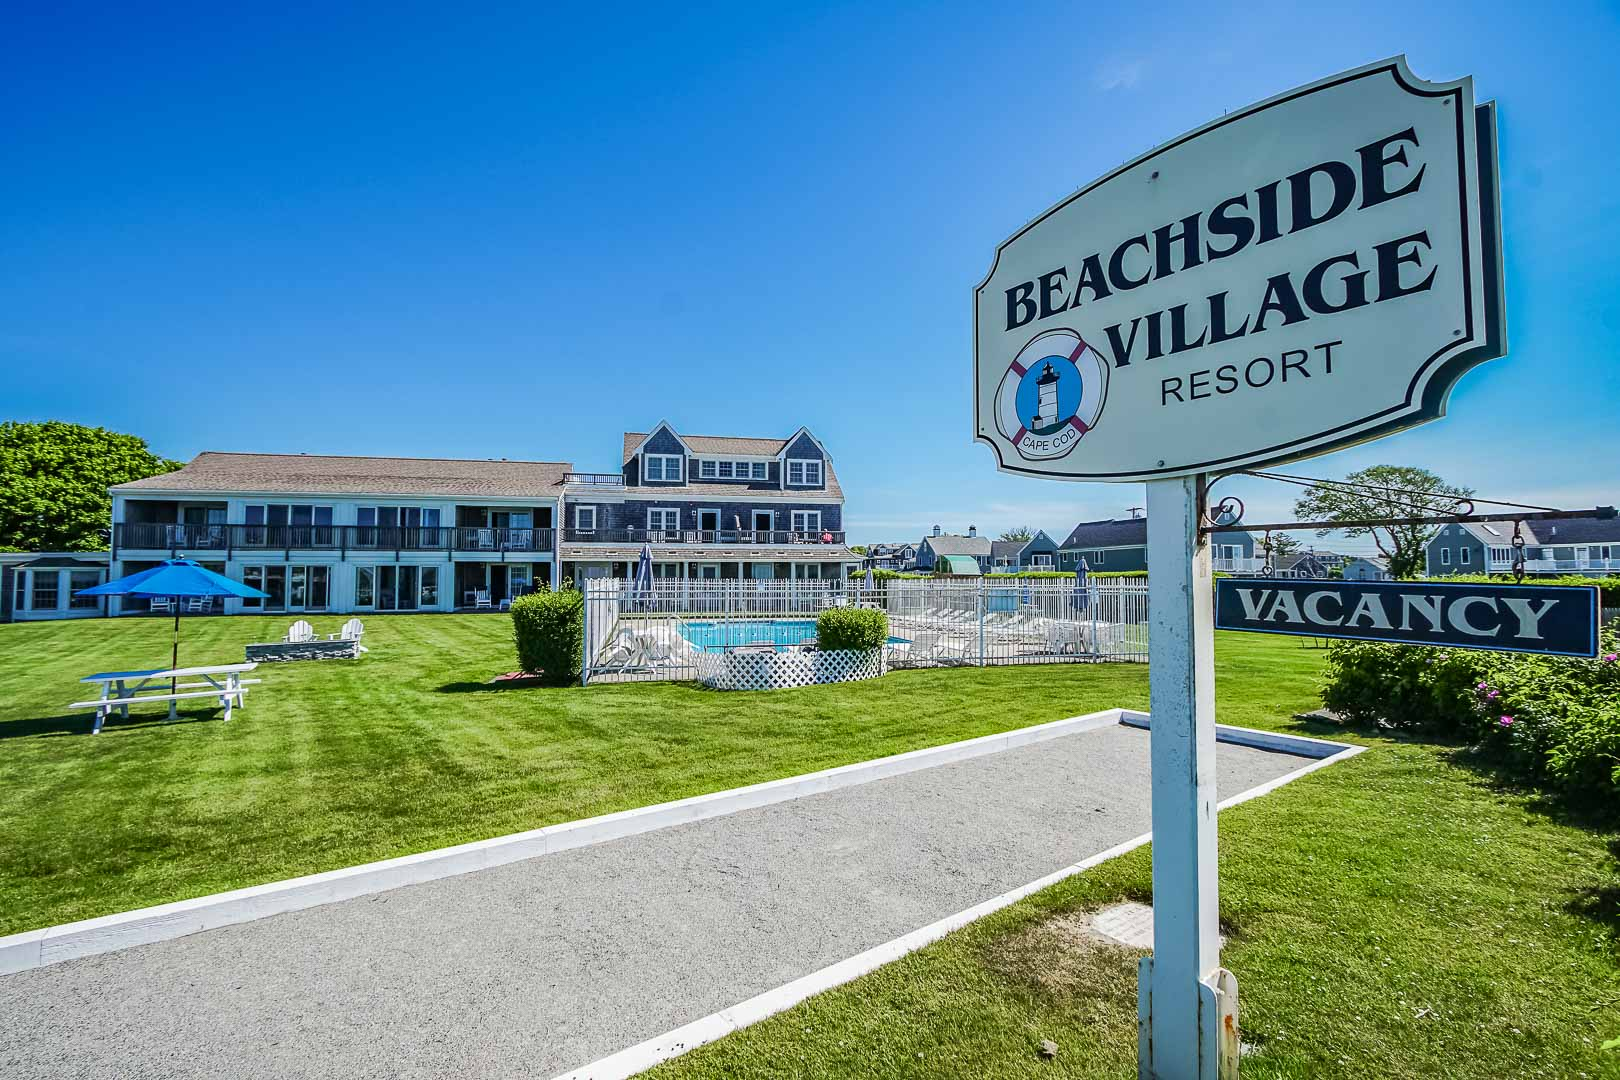 A welcoming resort entrance at VRI's Beachside Village Resort in Massachusetts.